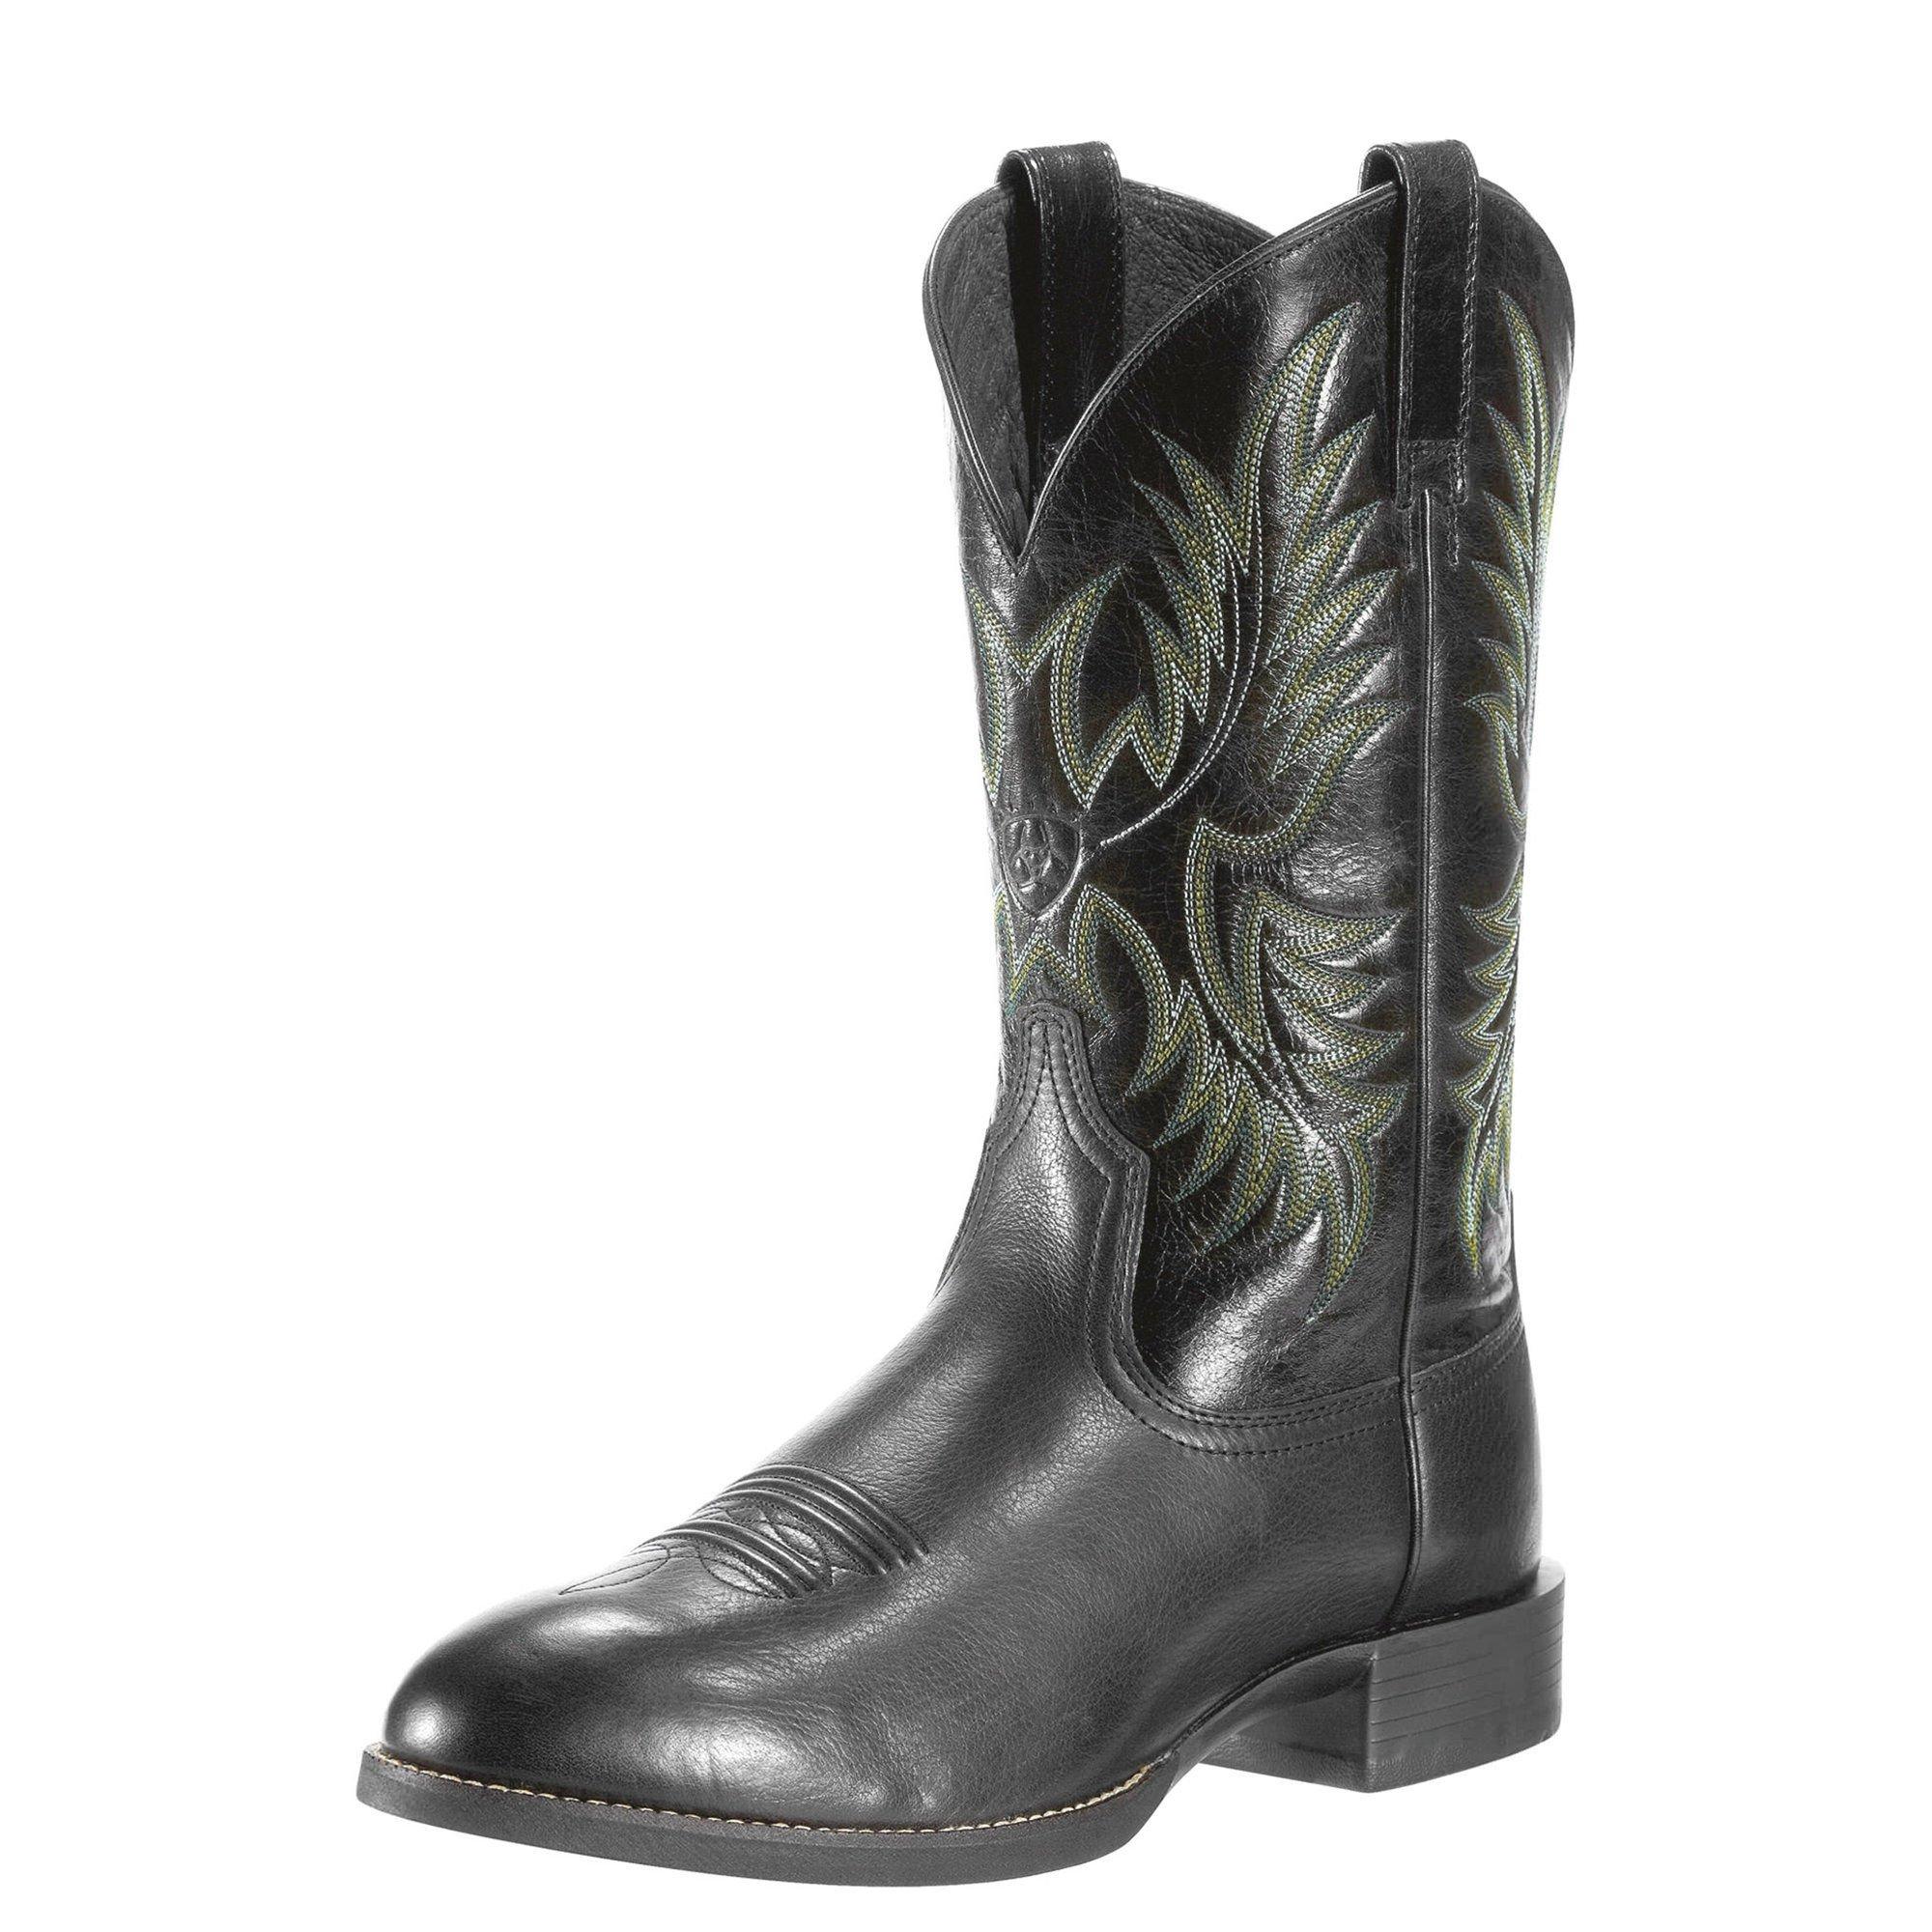 Ariat Men's Heritage Stockman Western Cowboy Boot, Black Deertan/Shiny Black, 12 2E US